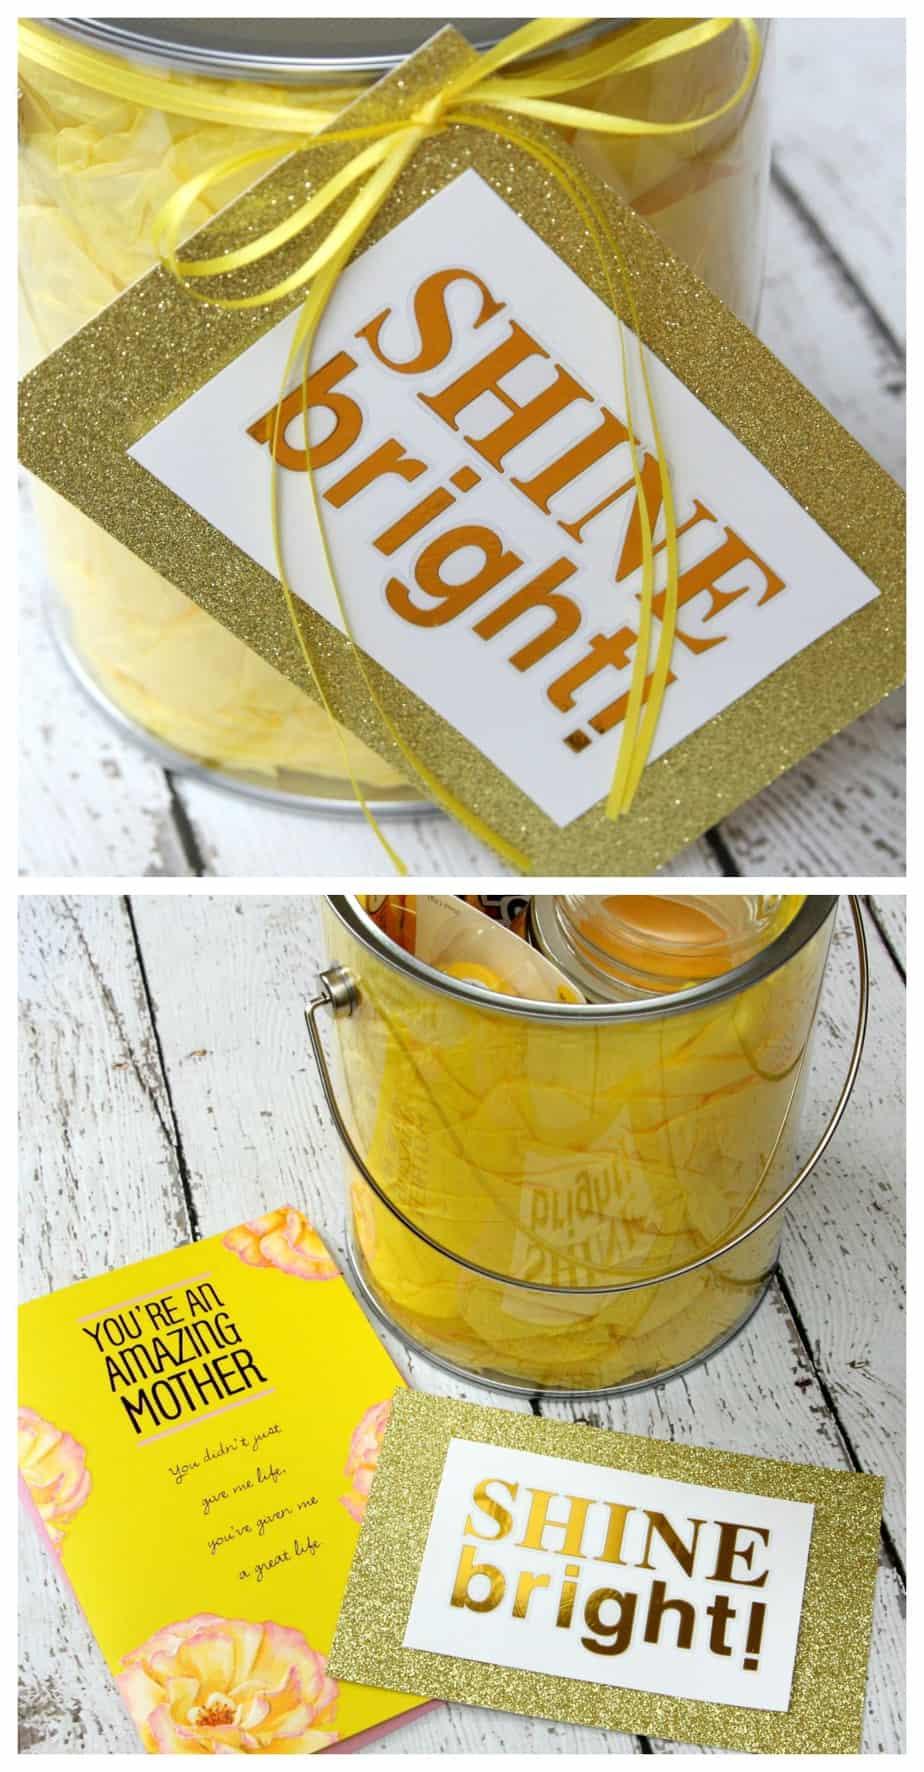 Shine-Bright-Gift-Idea-BestMomsDayEver-Ad